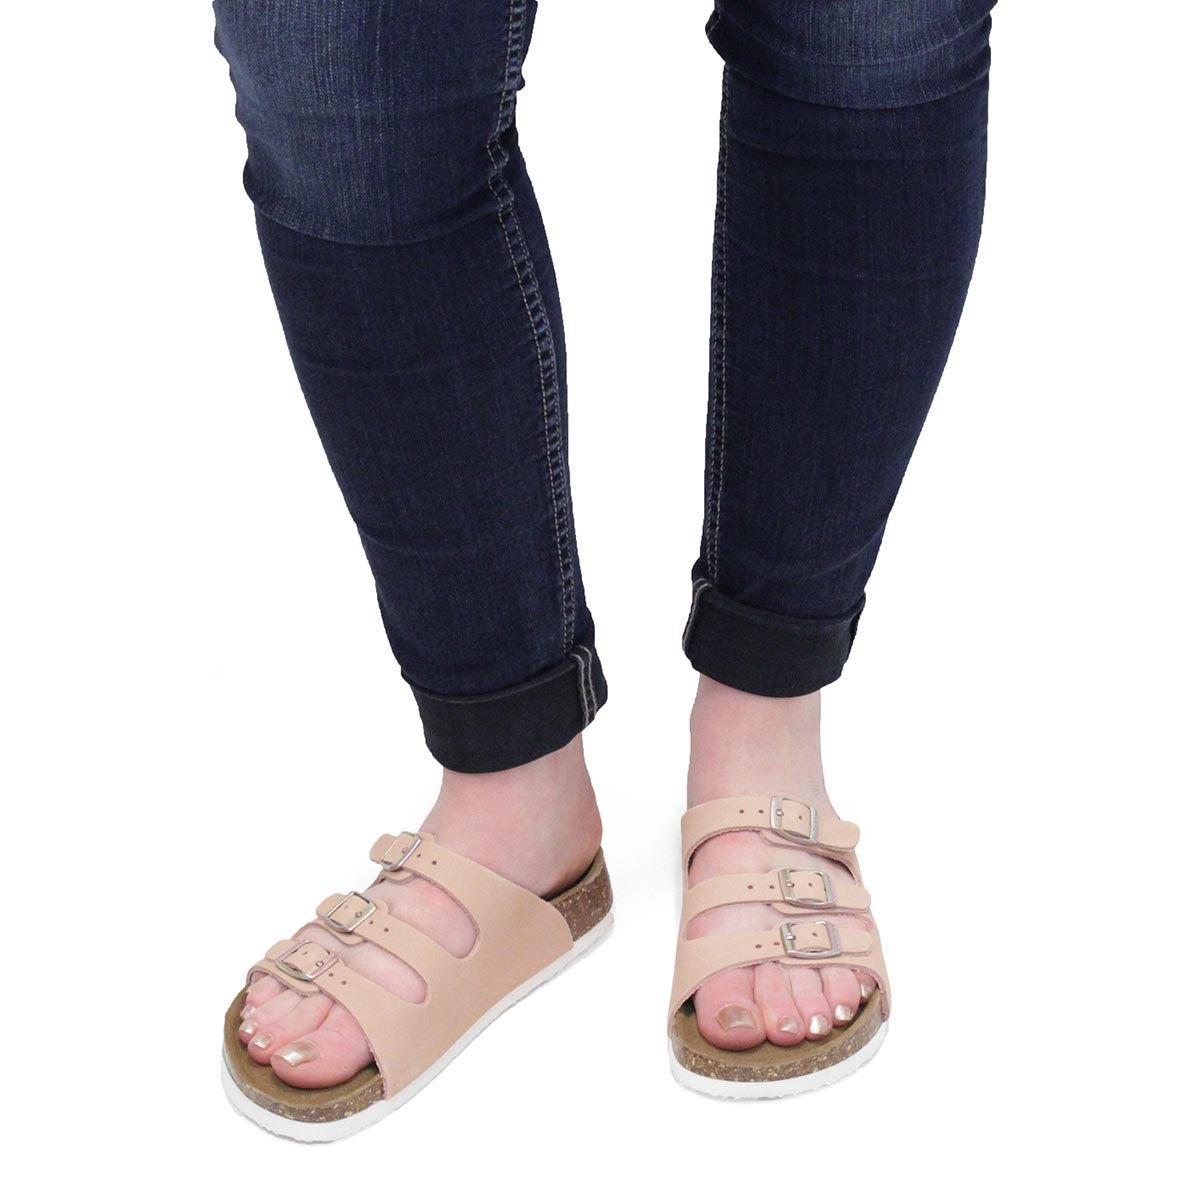 Lds Alexis 5 mil pnk slide sandal